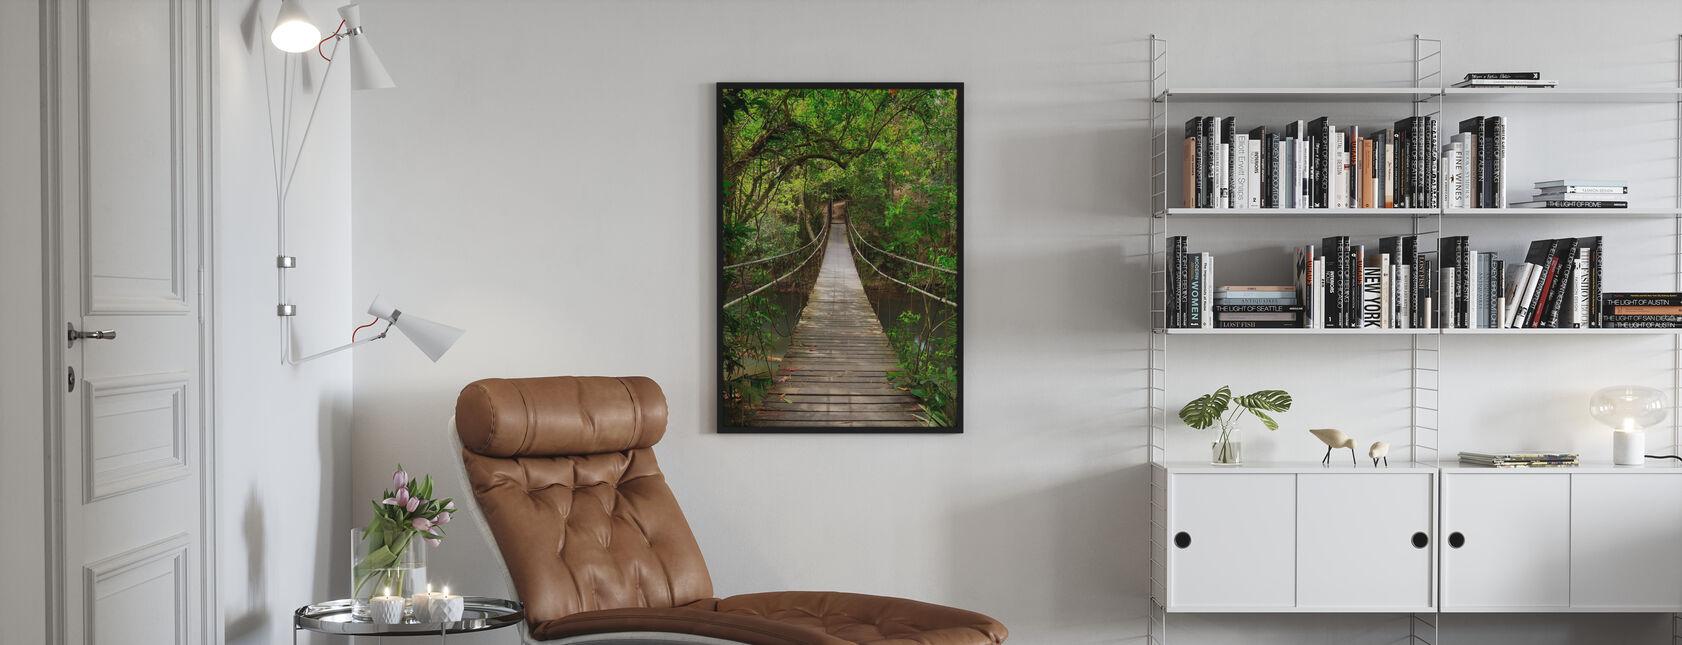 Regnskog vintreet bro - Plakat - Stue